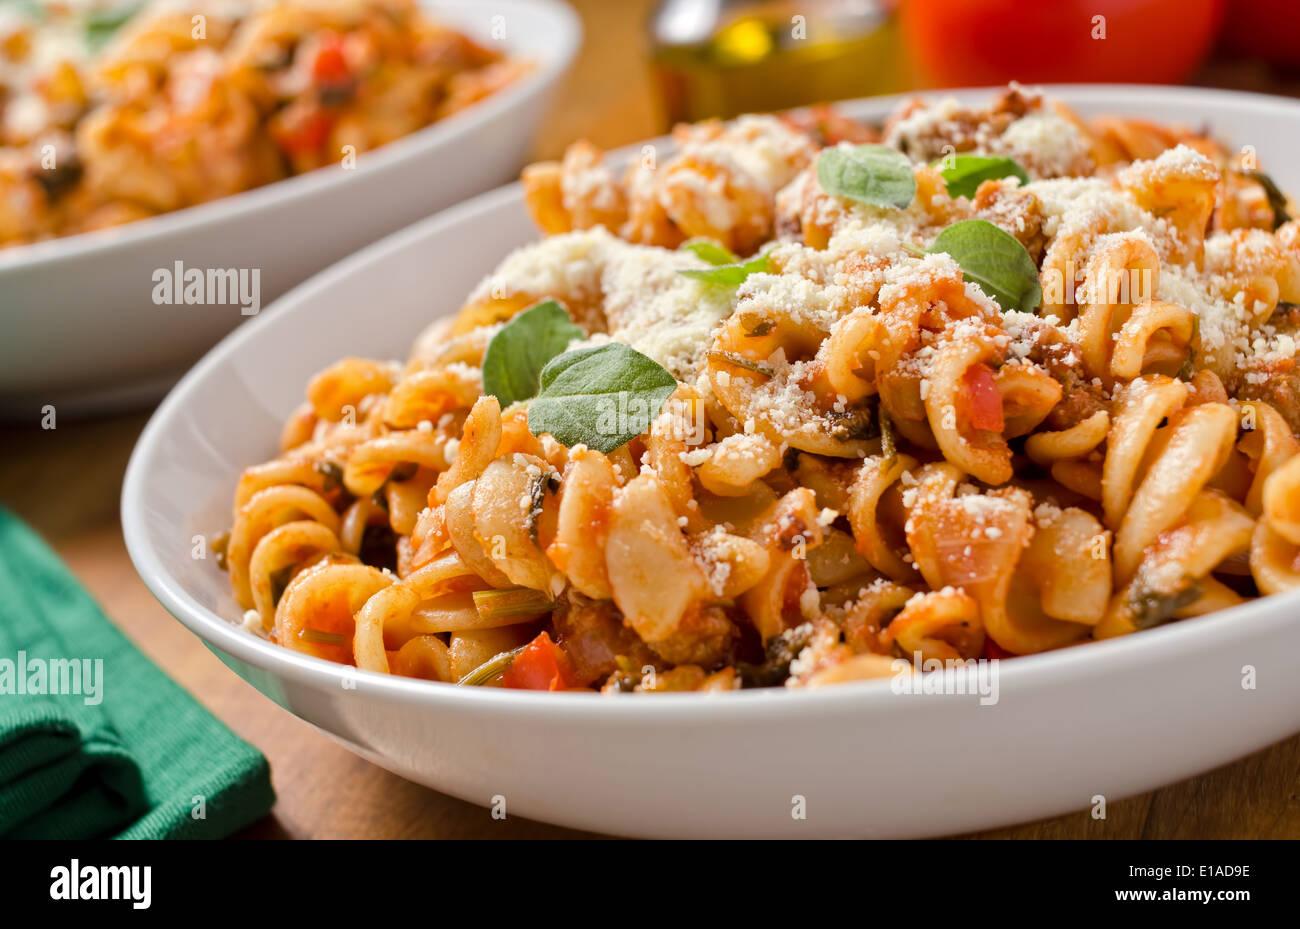 Pâtes Rotini avec sauce marinara, de parmesan et de basilic frais. Photo Stock